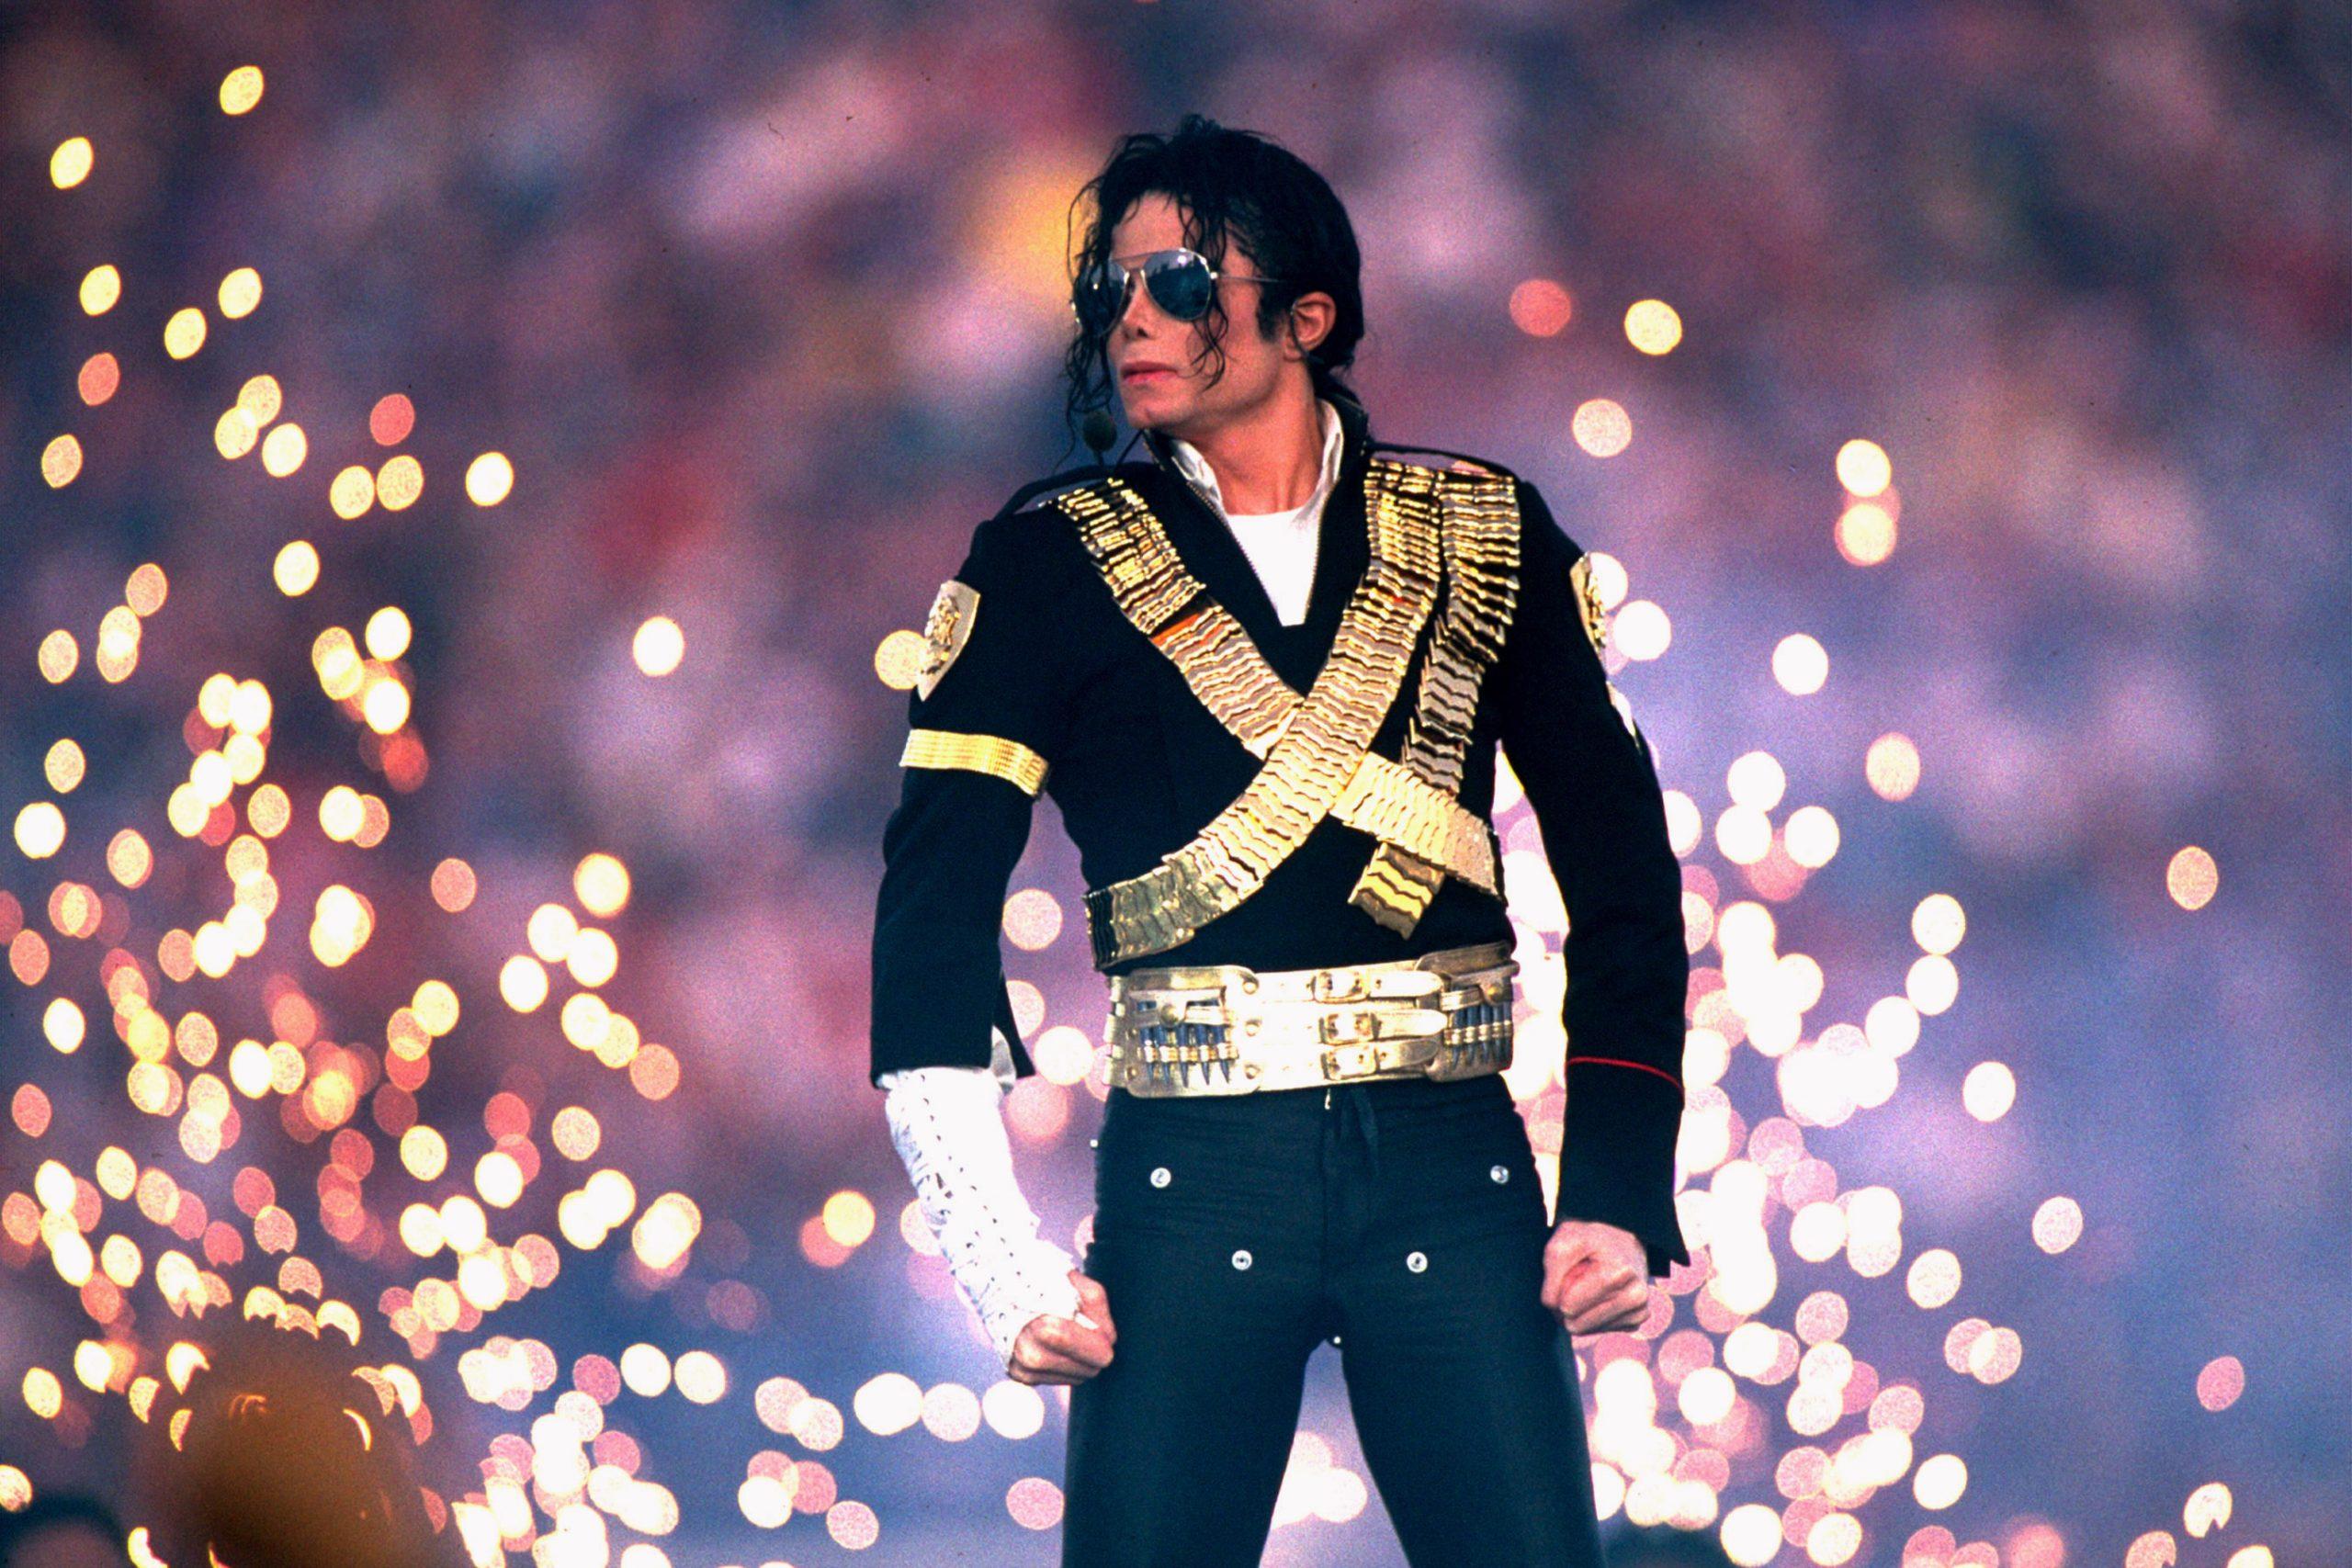 Michael Jackson Performs At Super Bowl XXVII Halftime Show – January 31, 1993